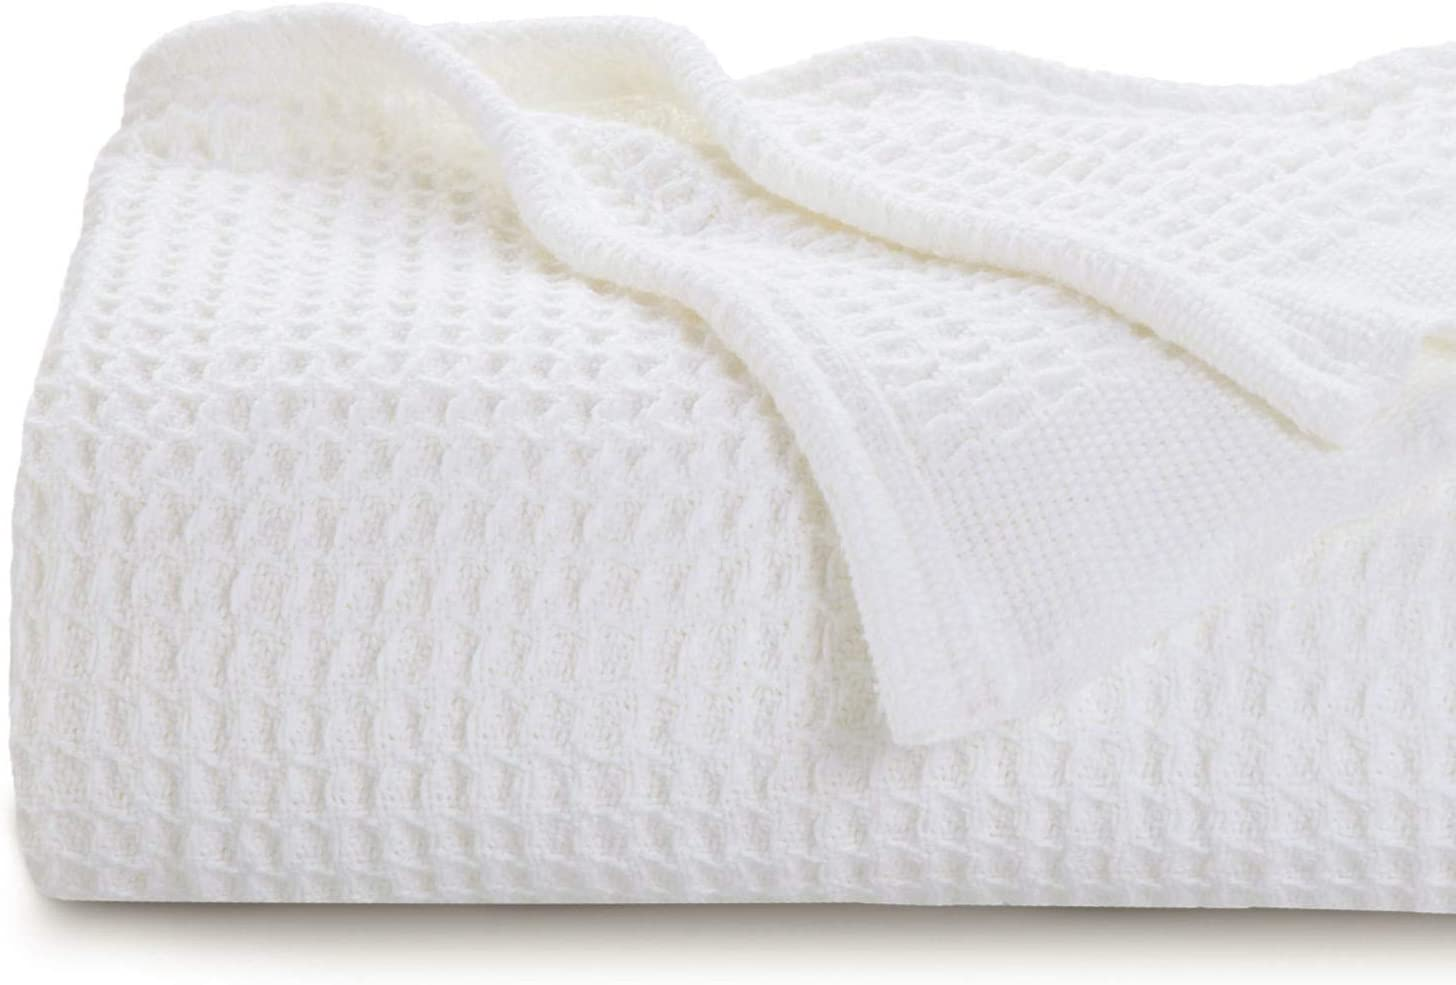 Bedsure 100% Cotton Blankets Twin NEW Size Waffle White Wea National uniform free shipping - 405GSM